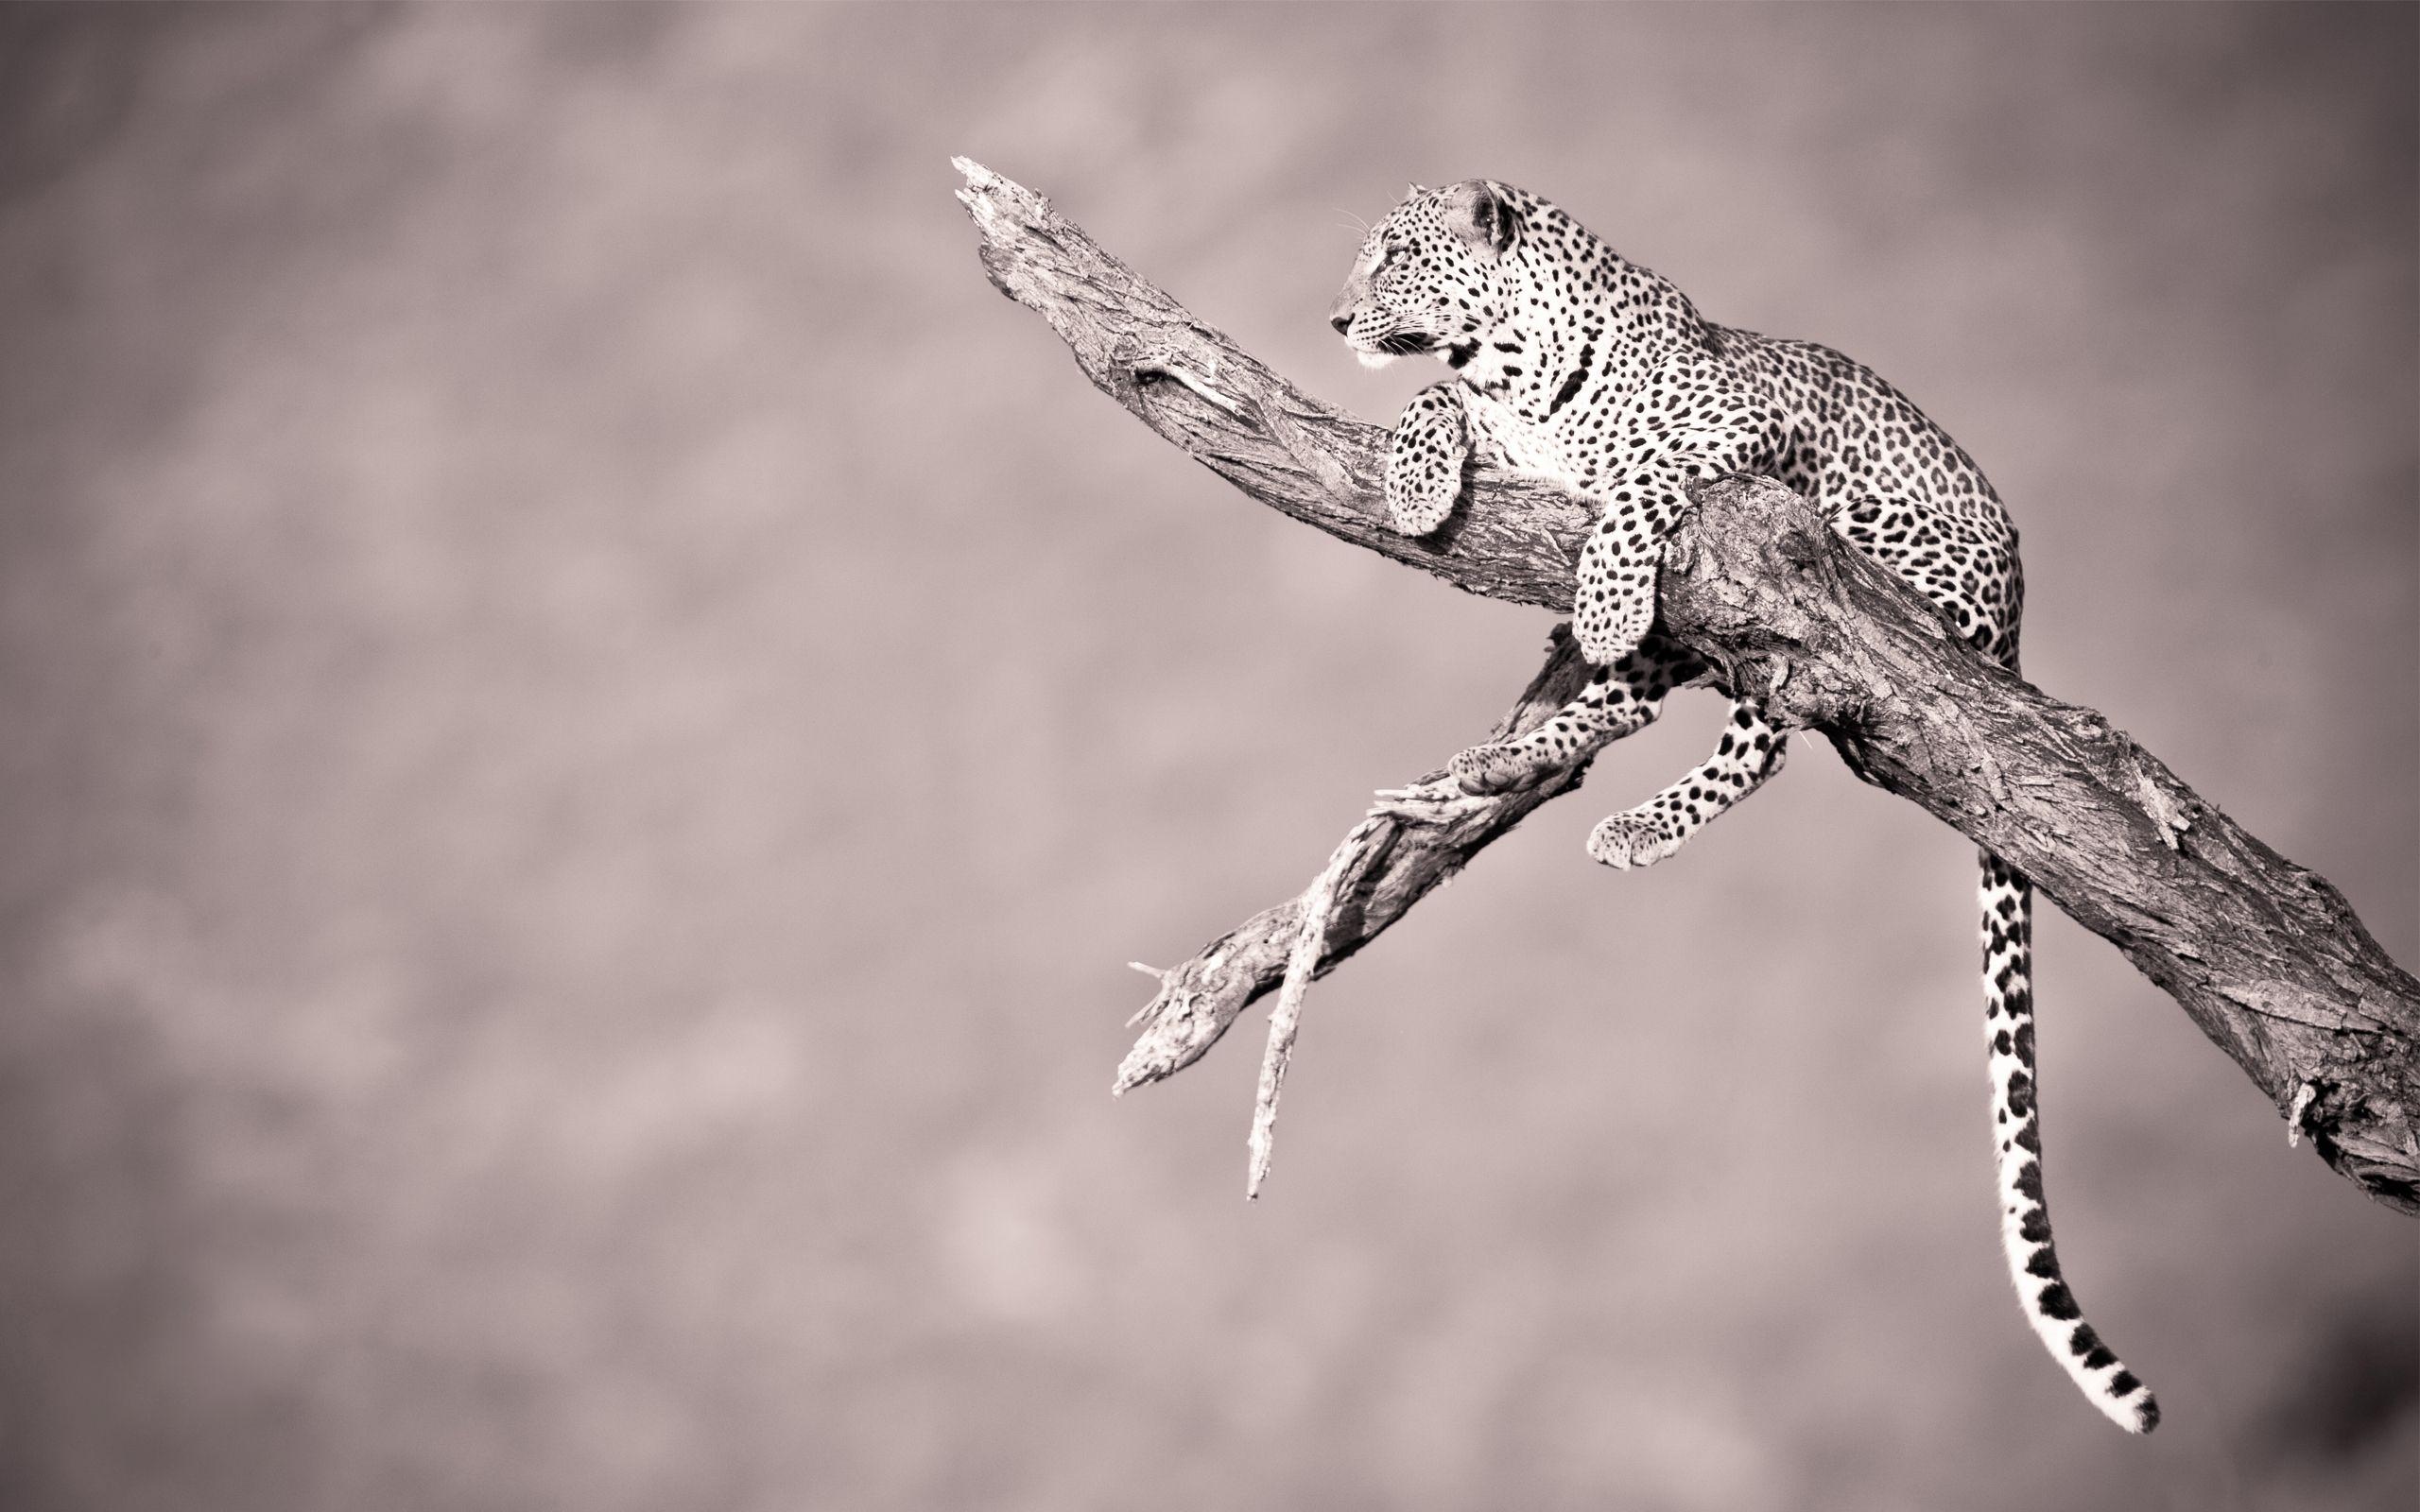 Great Wallpaper Desktop Background Wild Animal - d9026c1ca2b5e700fac67fc994a6eeae  Picture_684232 .jpg